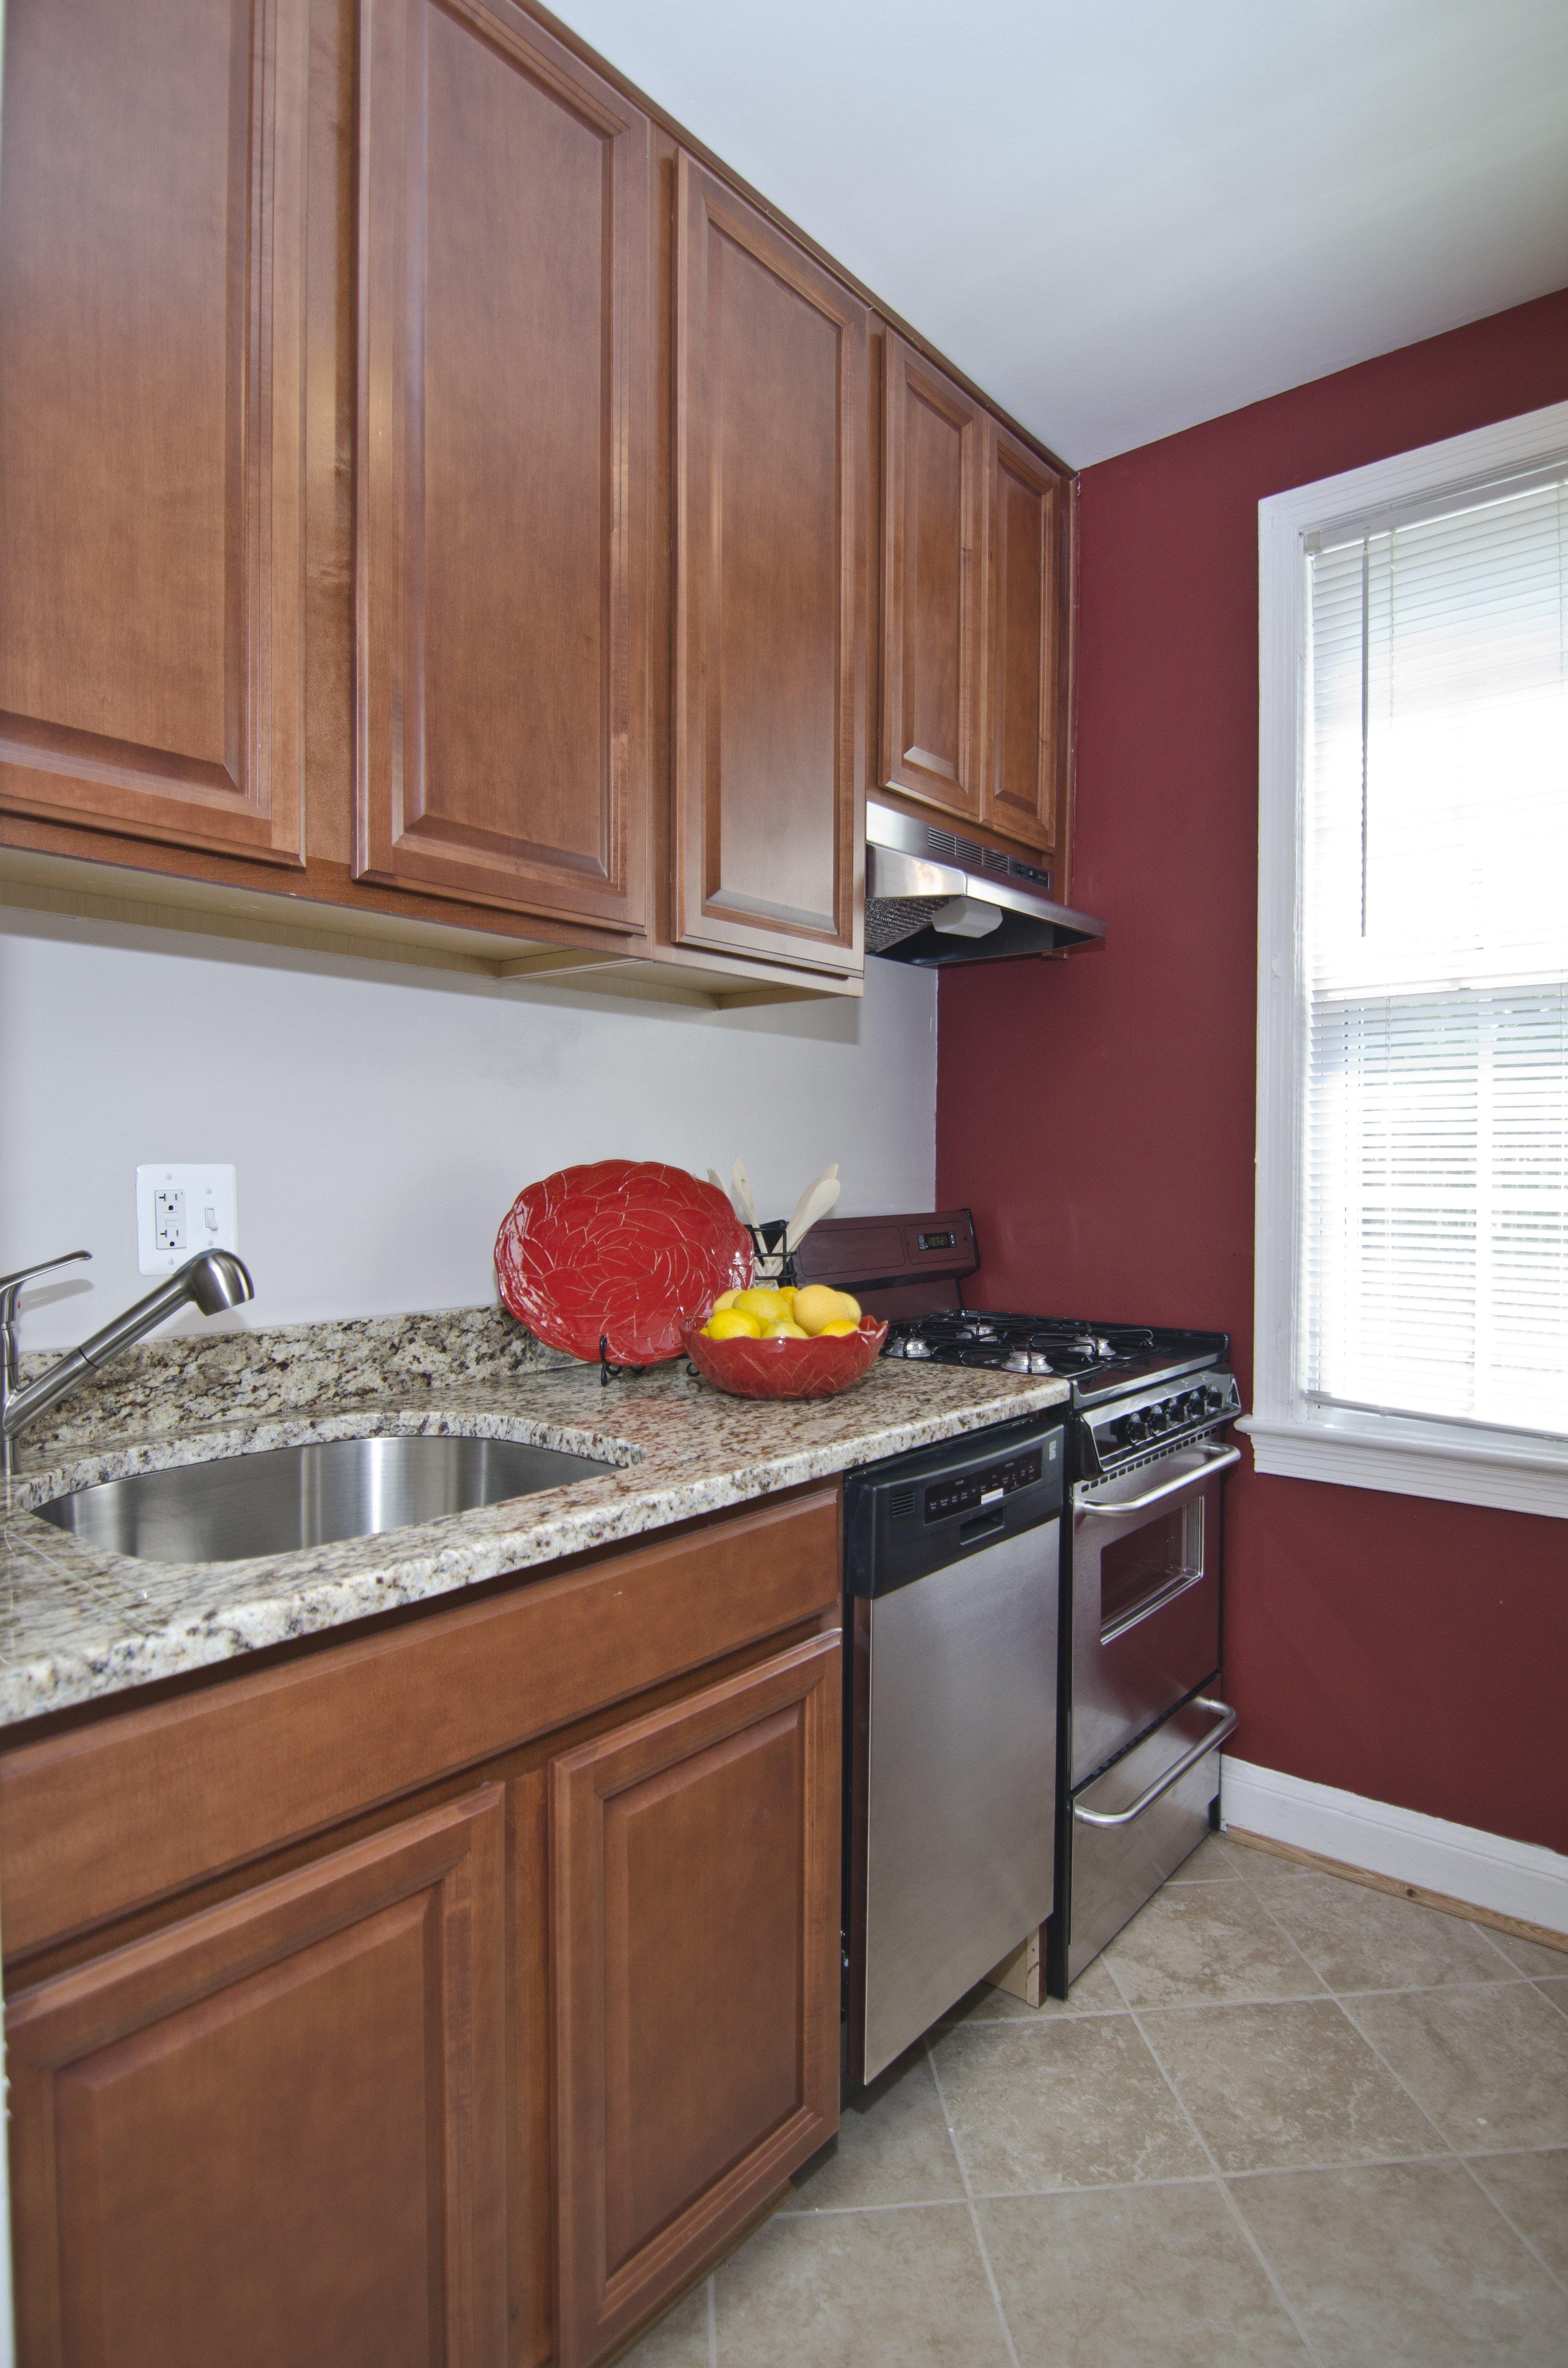 kitchen cabinets alexandria va under cabinet lighting manor house apartments photo gallery